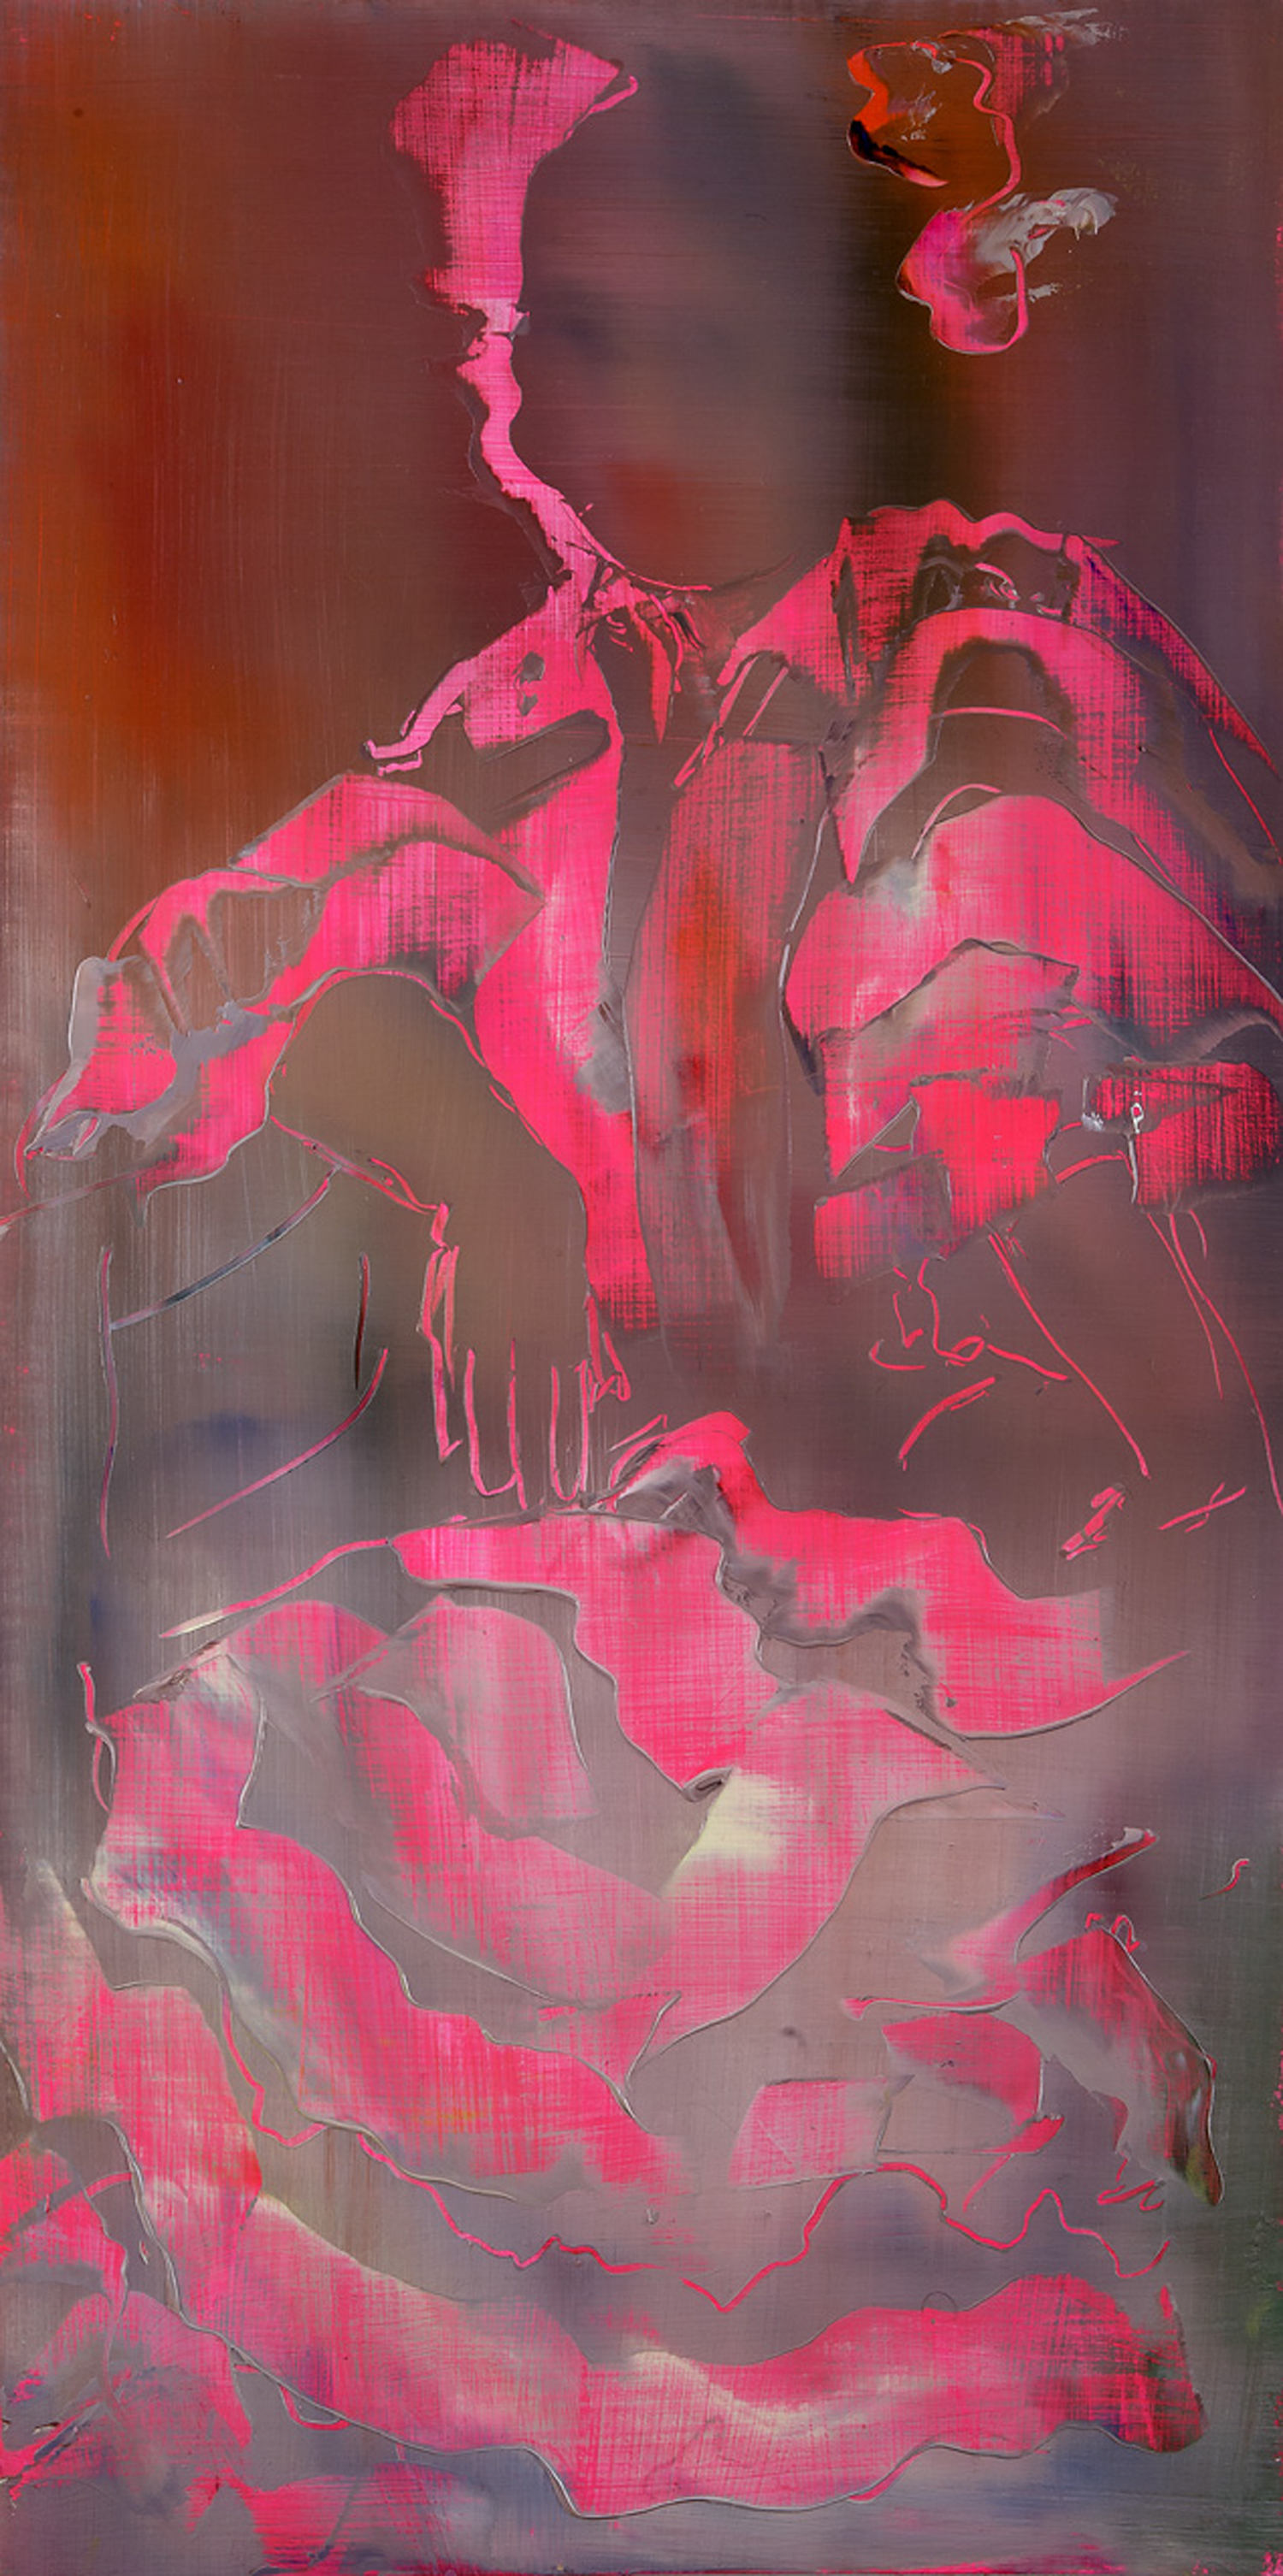 Pink Dress (after Sorolla), 2012